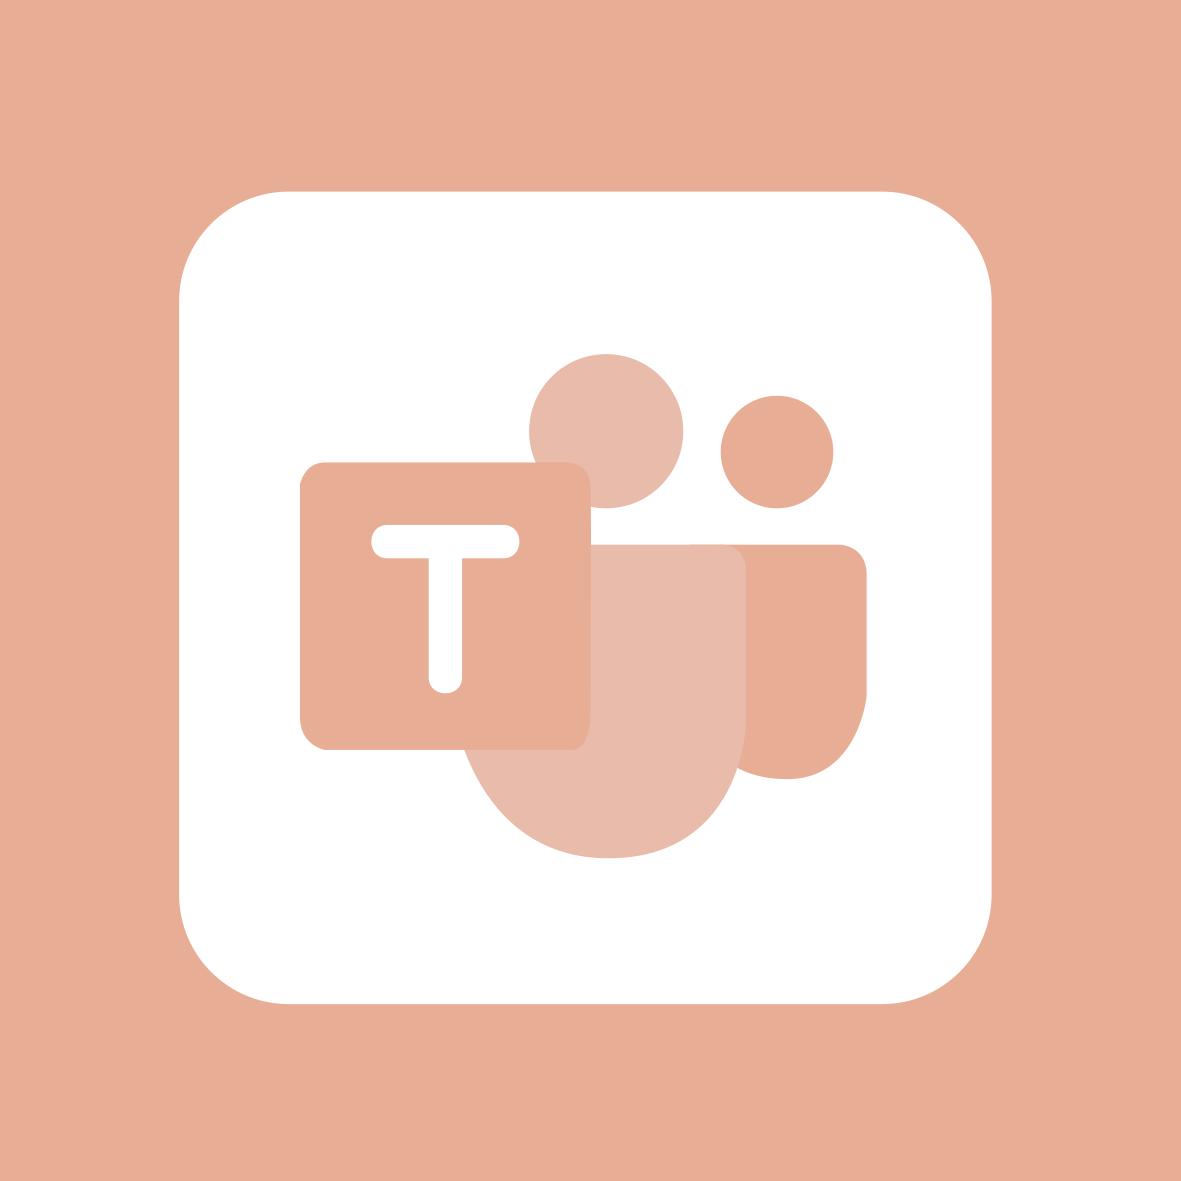 Byanneart Shop Redbubble Iphone Photo App Iphone Wallpaper App App Icon